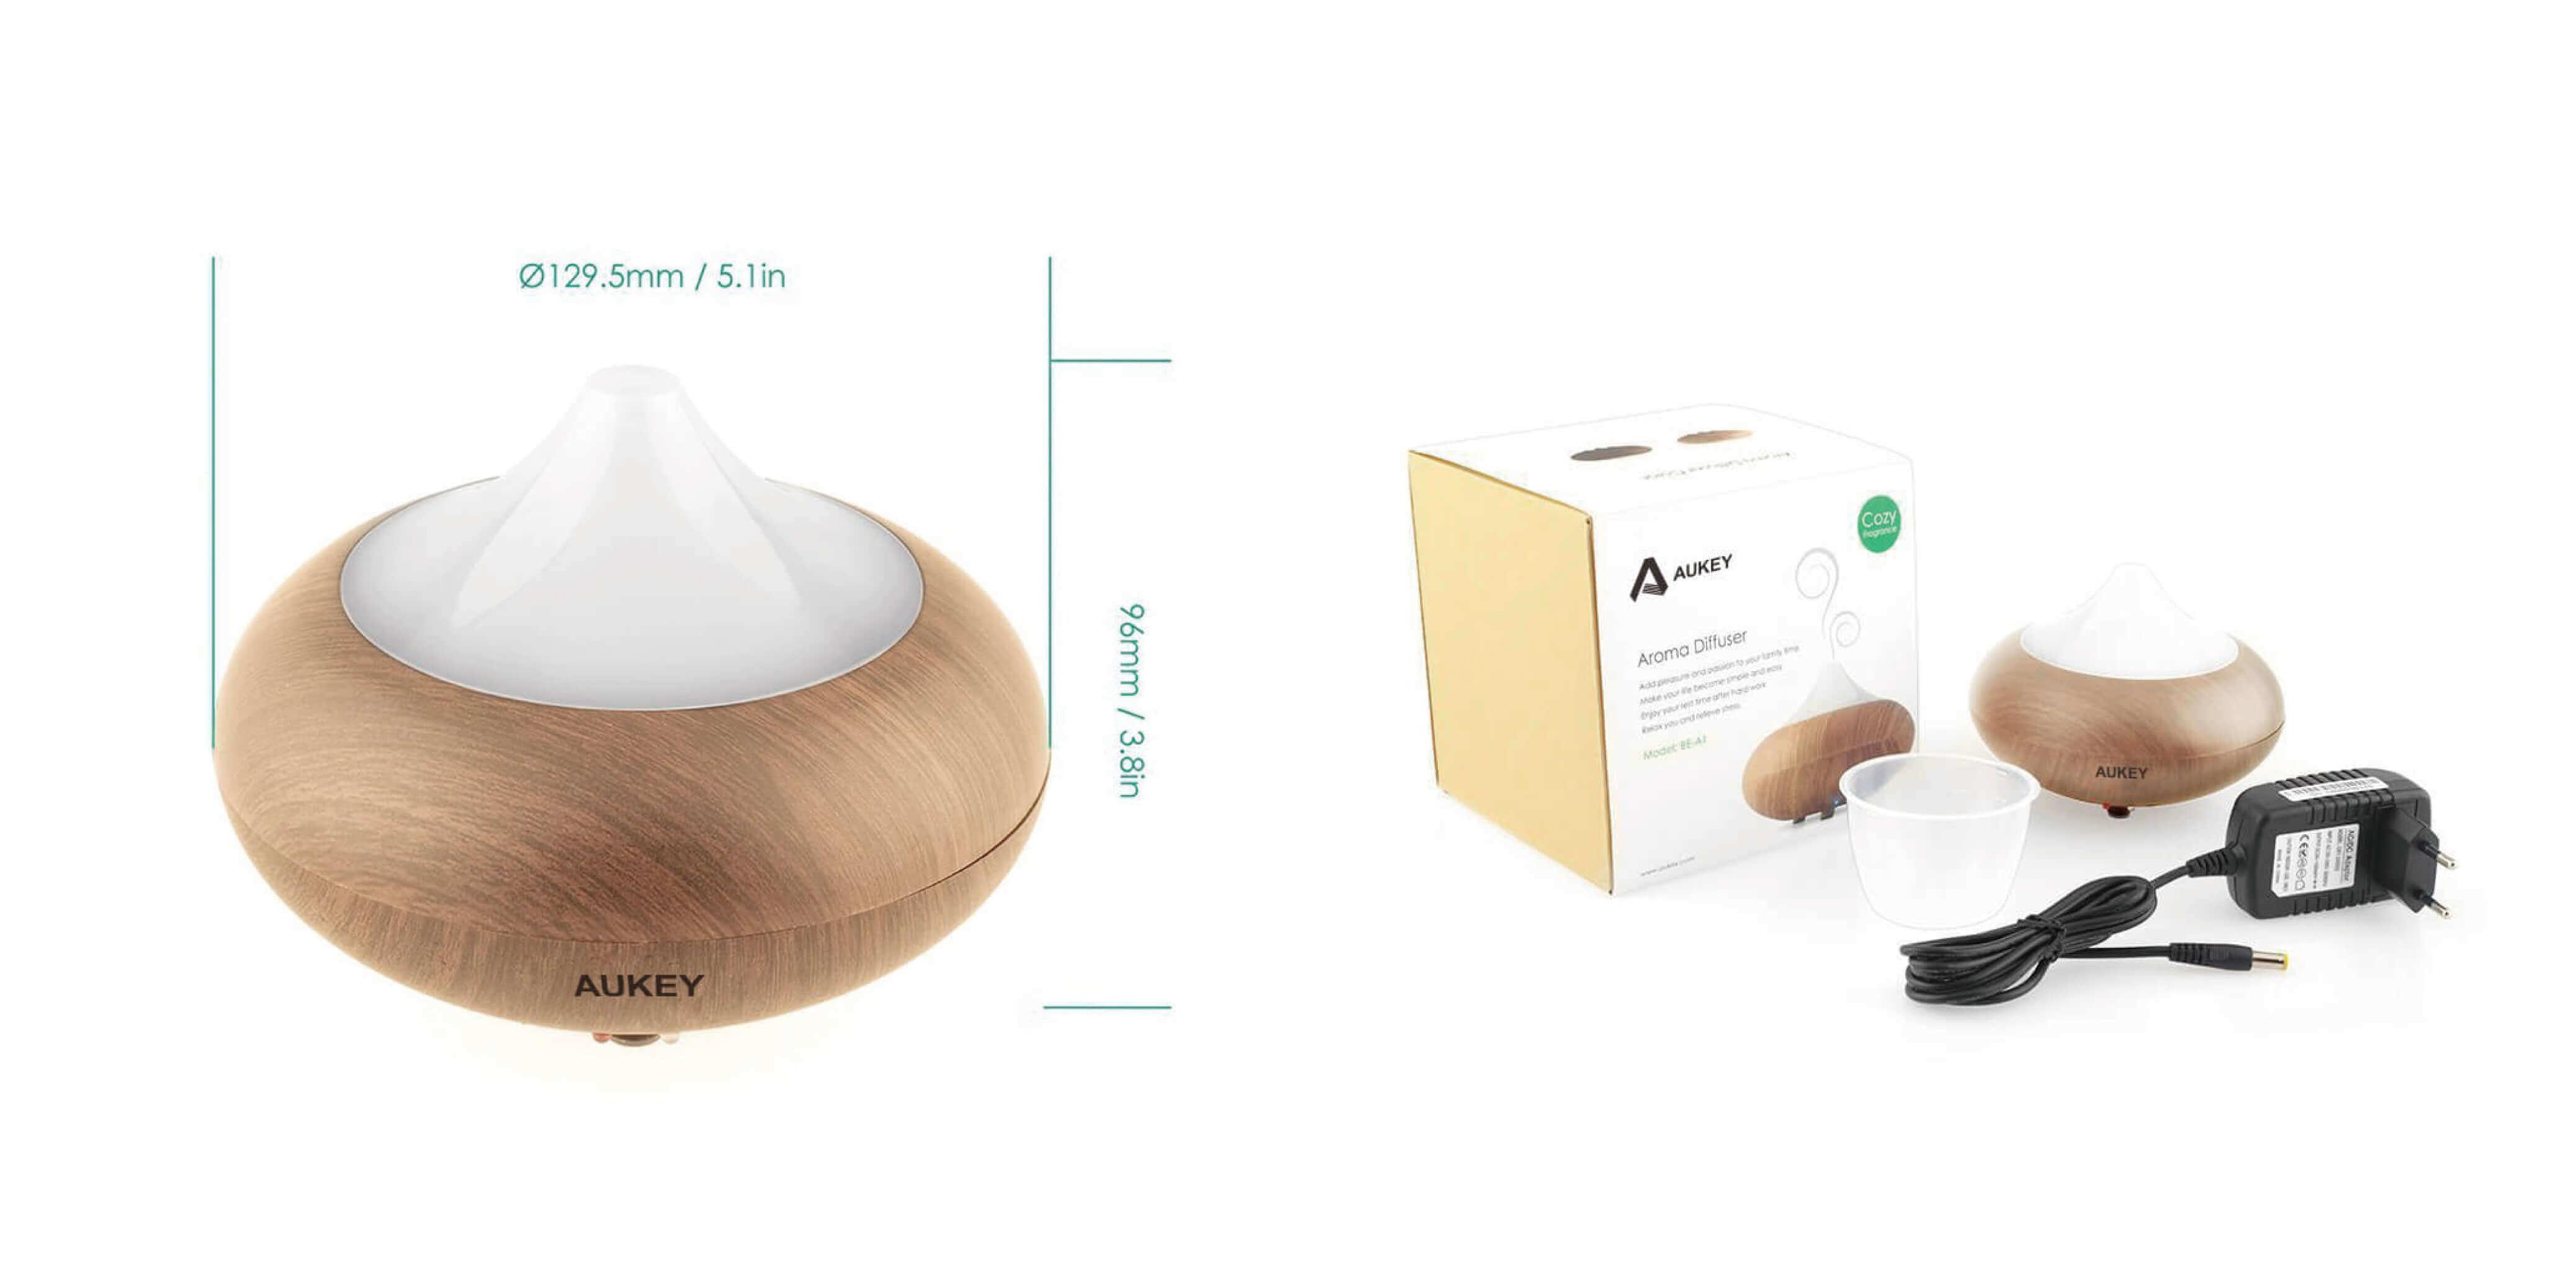 be-a1-light-wood-information-compressed.jpg